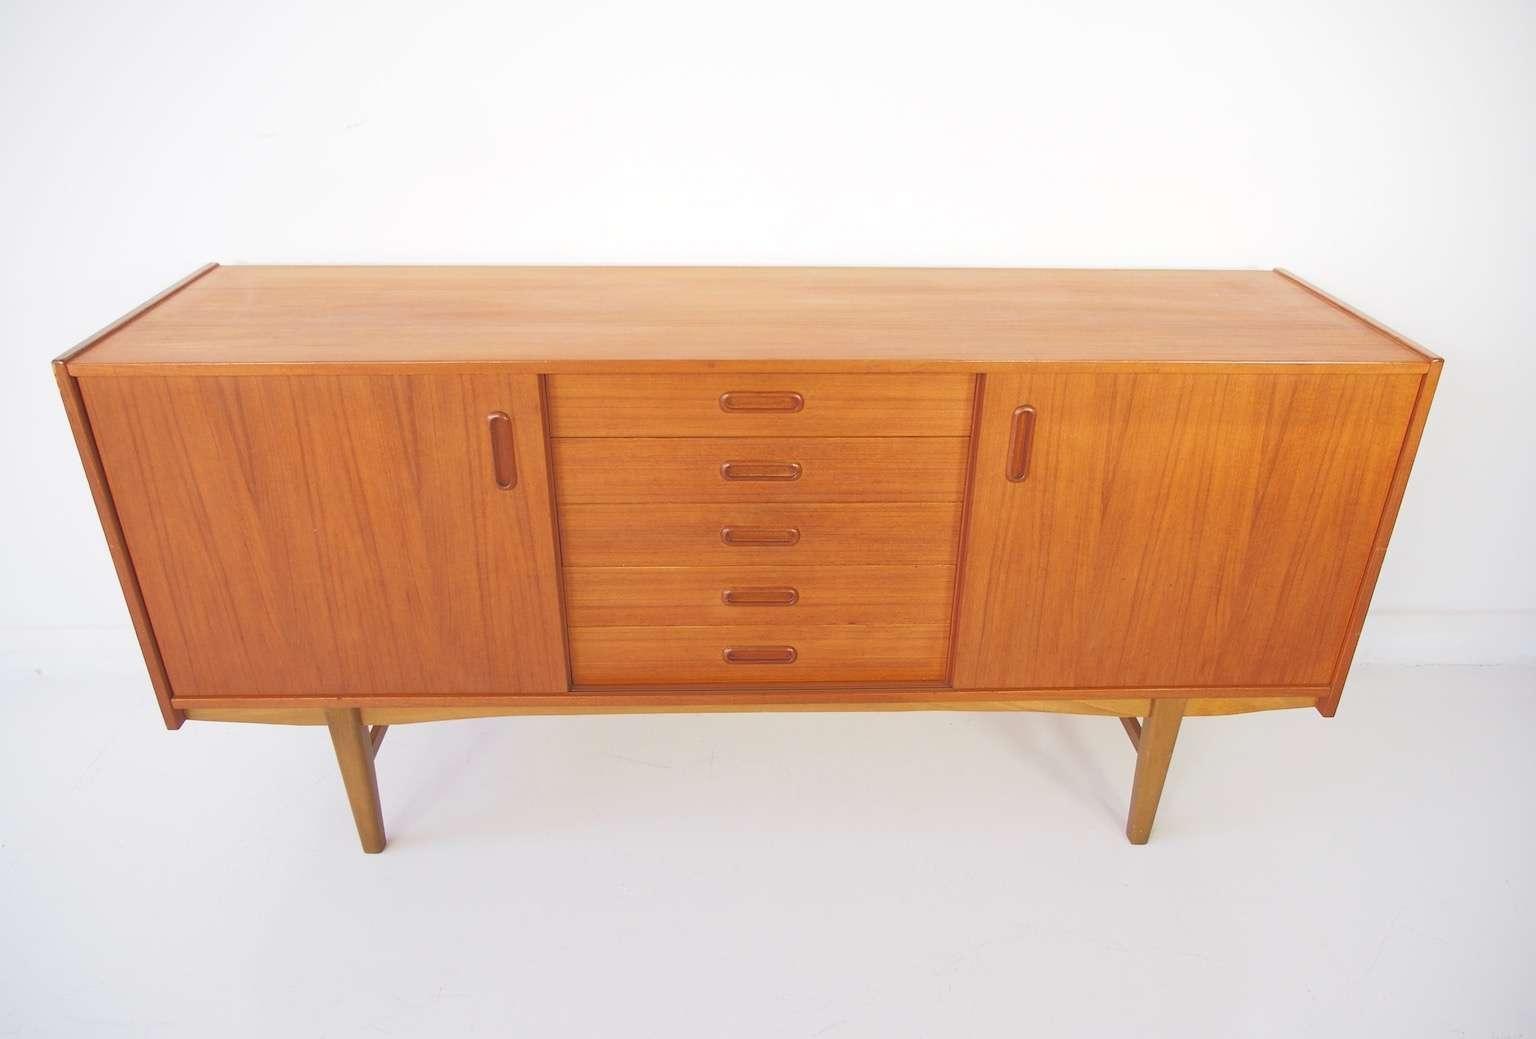 Scandinavian Modern Teak Sideboard With Shelves And Drawers, 1960s Within Scandinavian Sideboards (View 12 of 20)